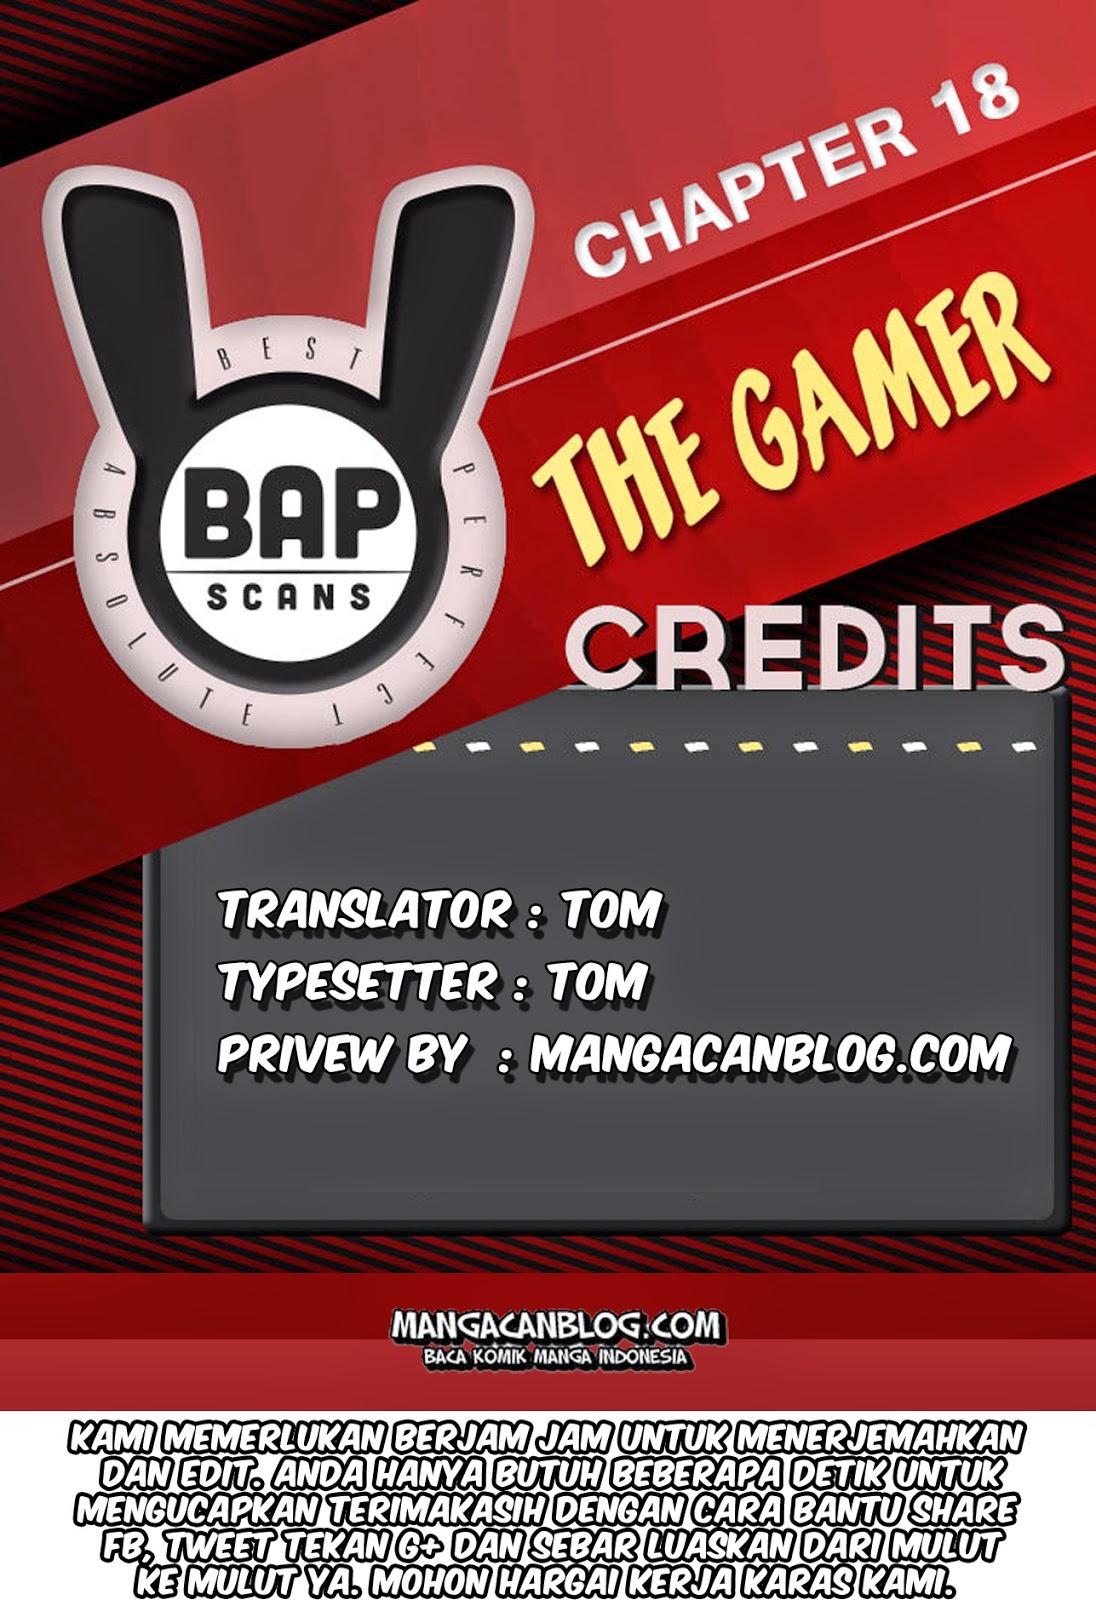 Dilarang COPAS - situs resmi www.mangacanblog.com - Komik the gamer 018 - chapter 18 19 Indonesia the gamer 018 - chapter 18 Terbaru |Baca Manga Komik Indonesia|Mangacan